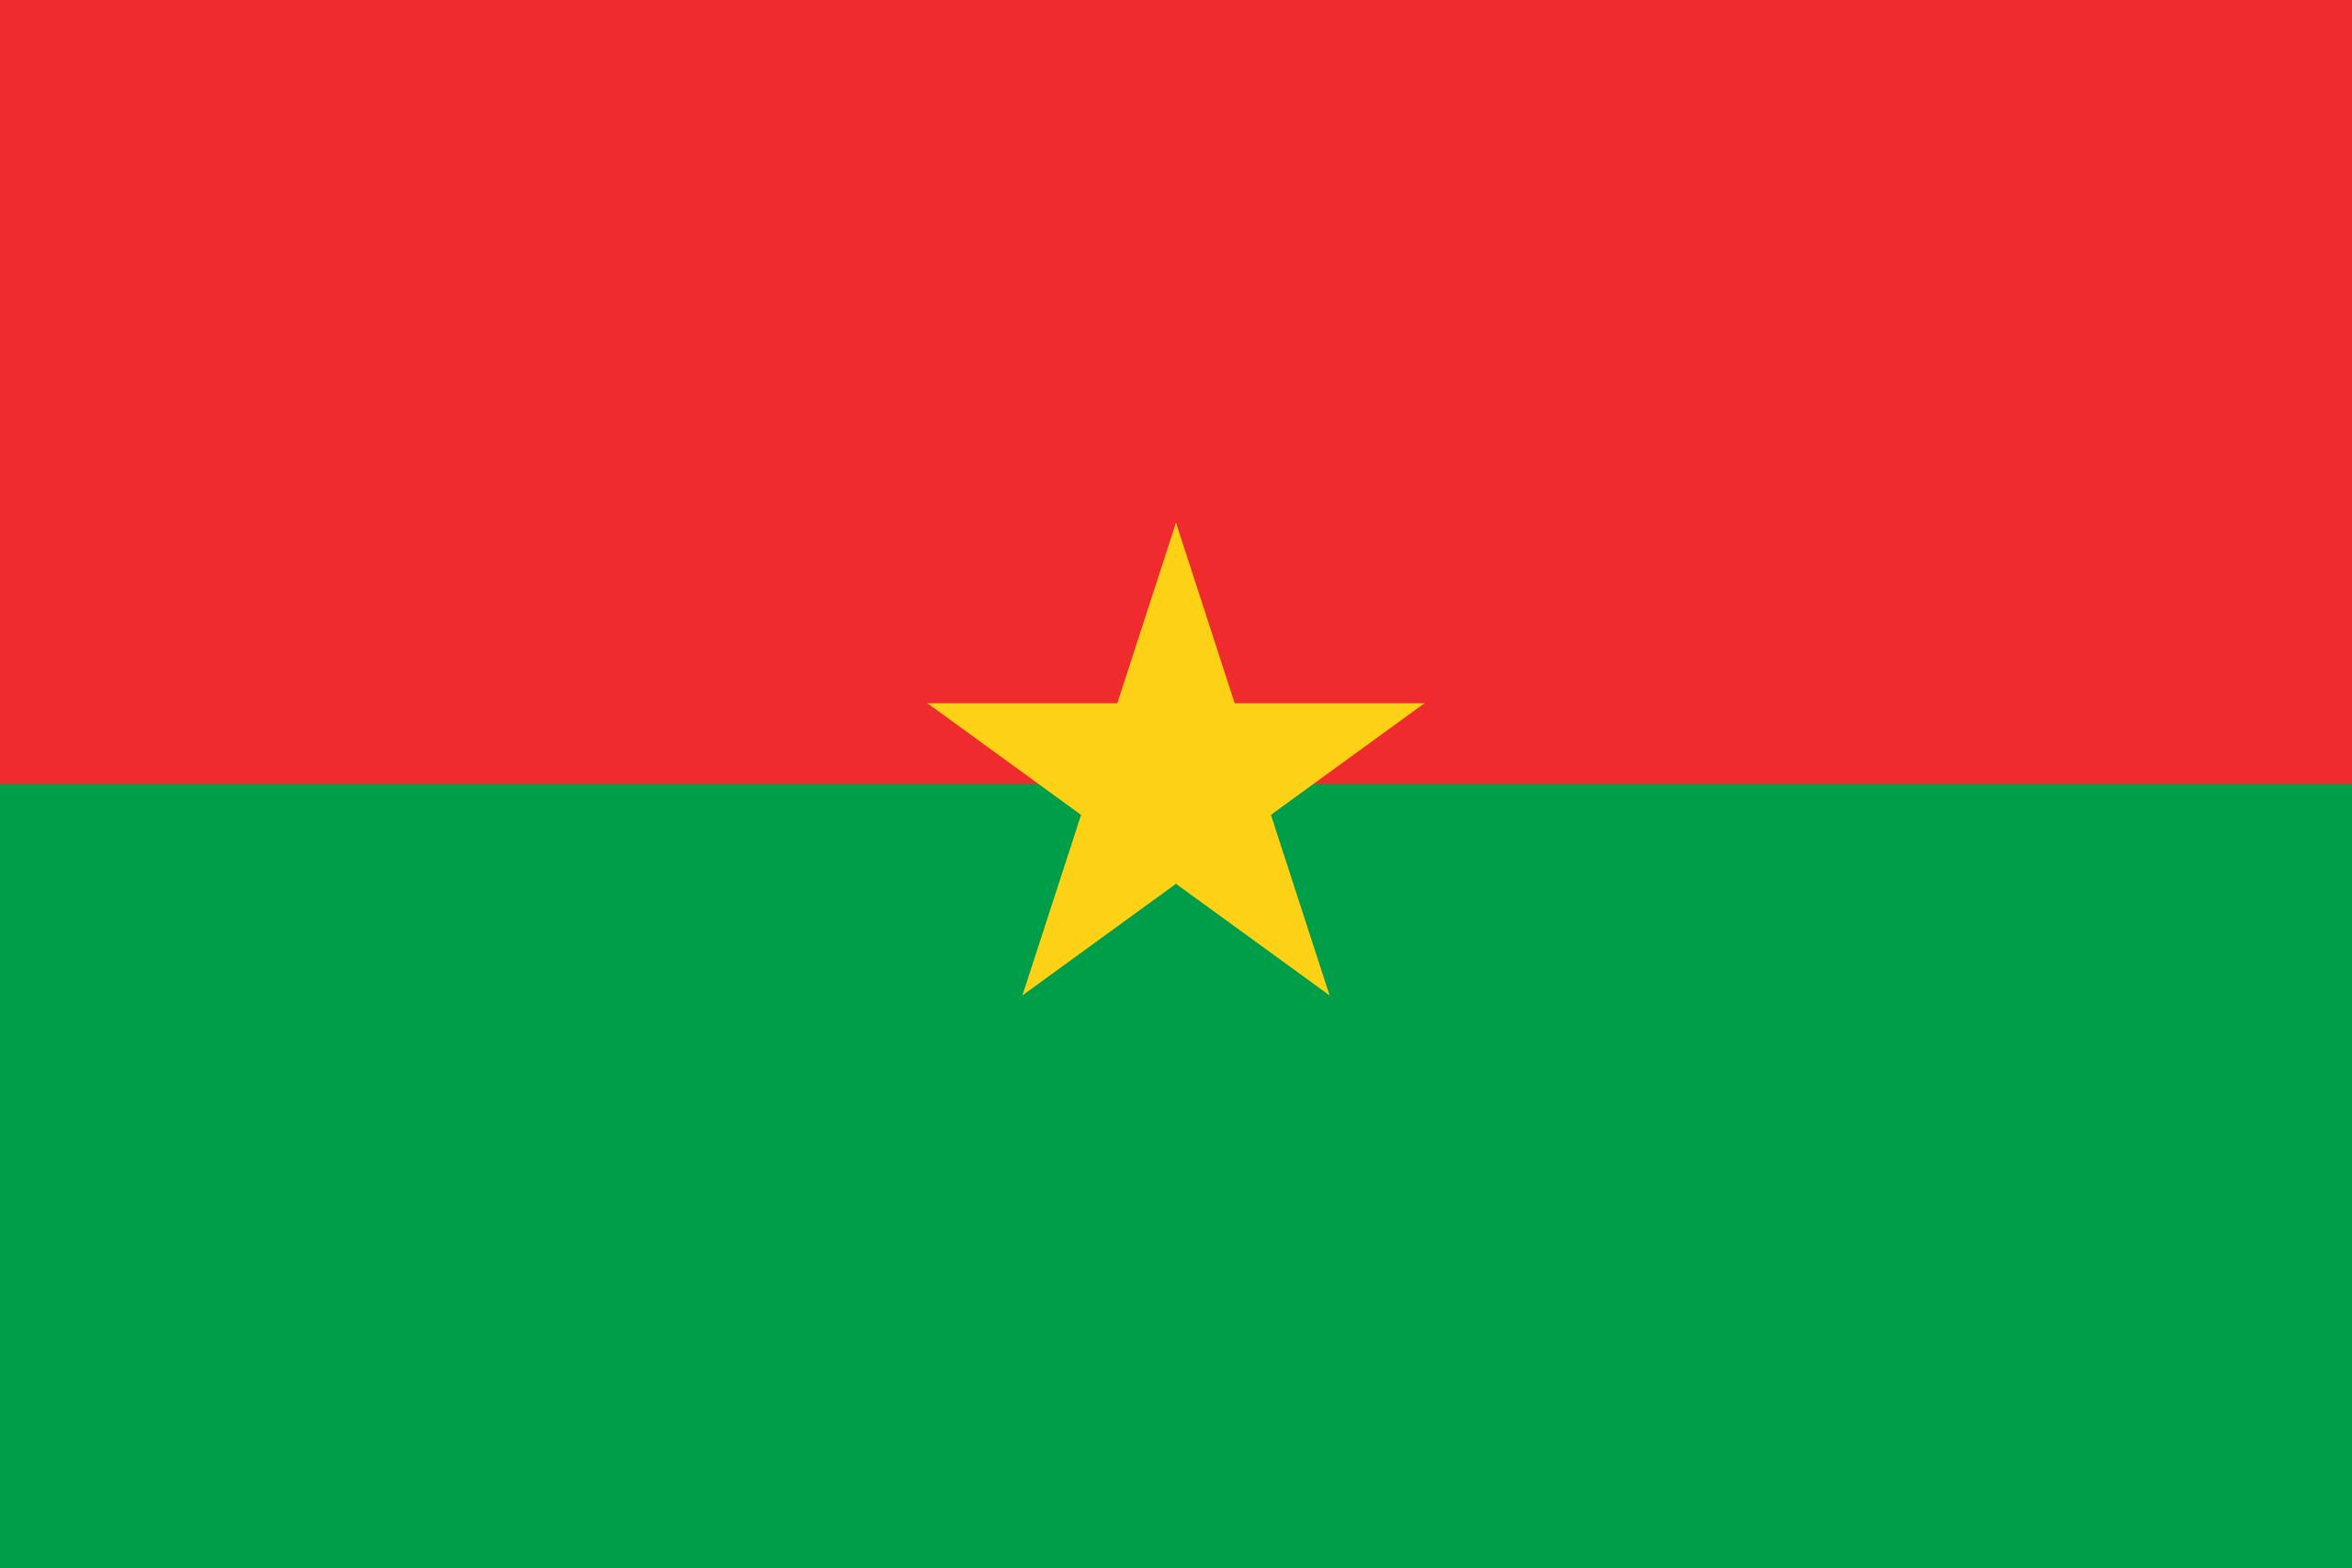 burkina faso, देश, emblema, लोग�प्रतीकbolo - HD वॉलपेपर - प्रोफेसर-falken.com